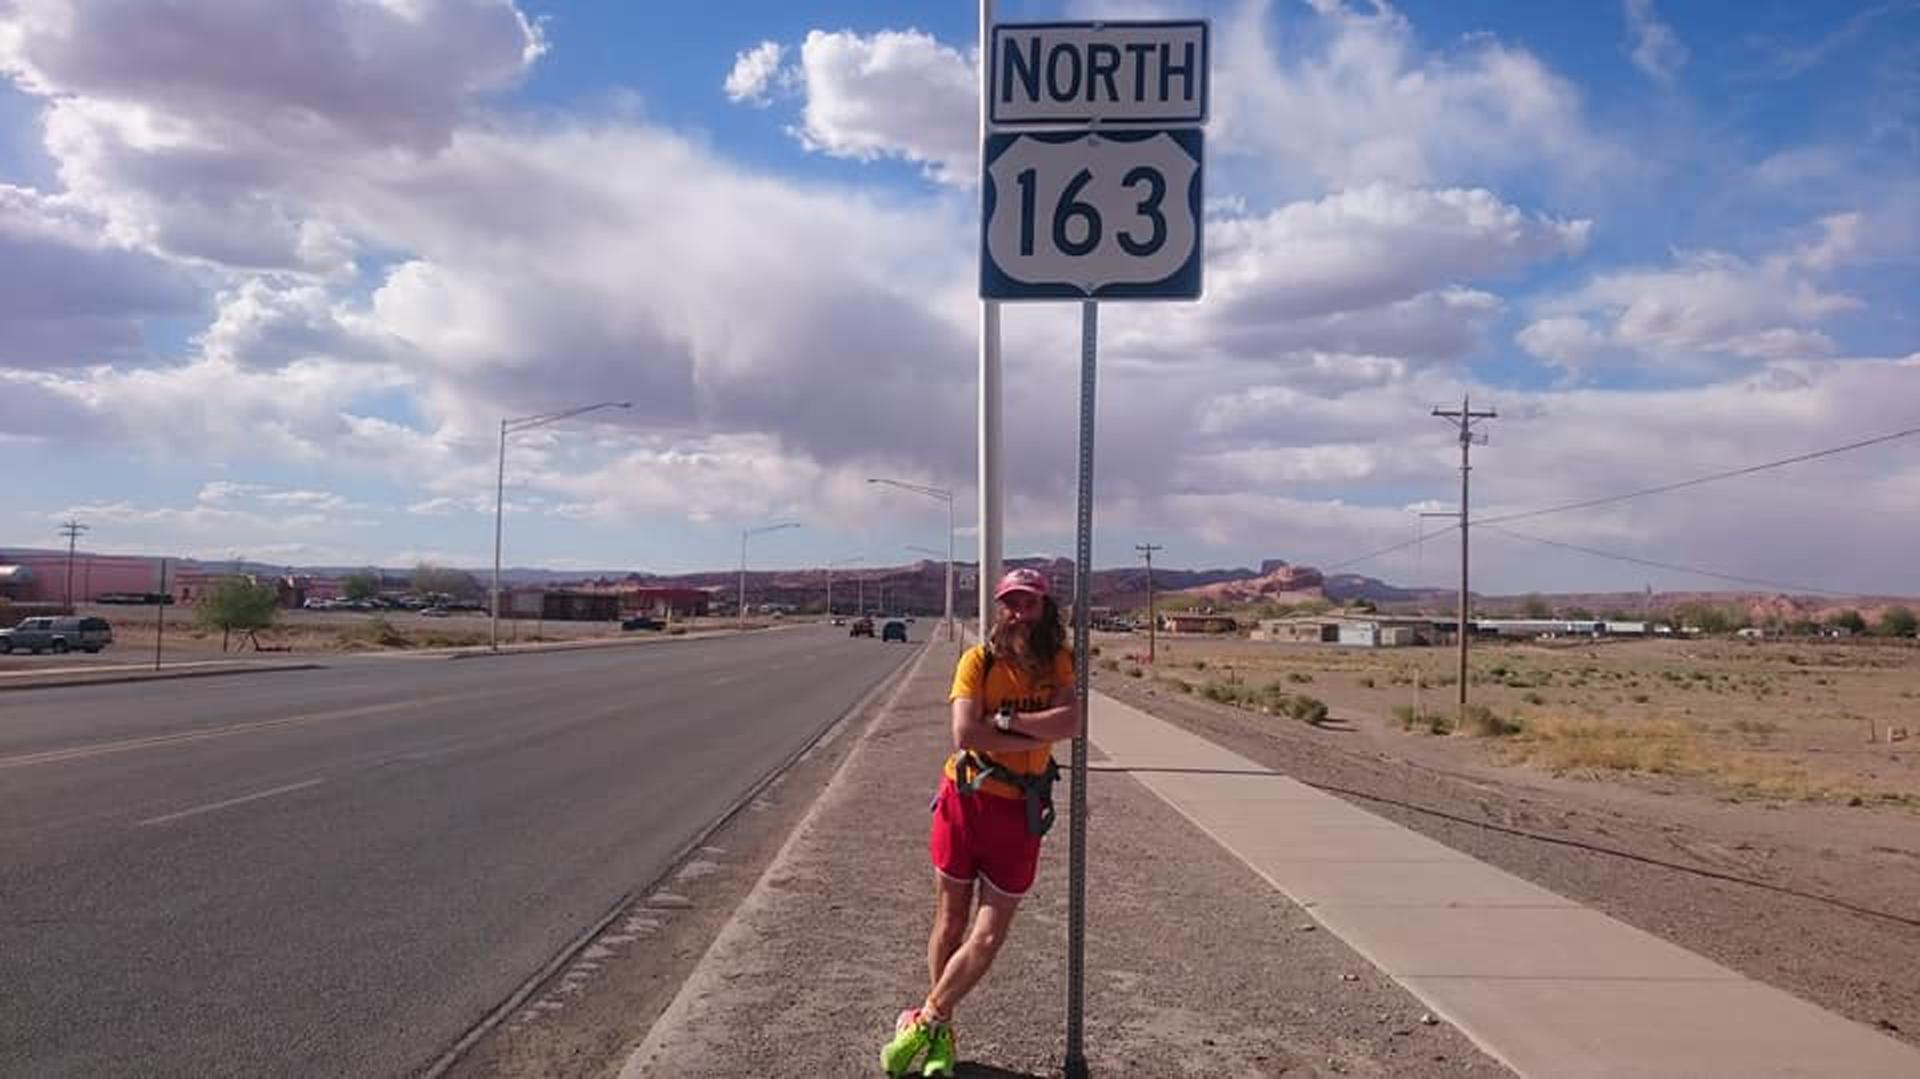 Pope recorrió casi 25 mil km (Facebook/Run Robla Run – Going The Distance)